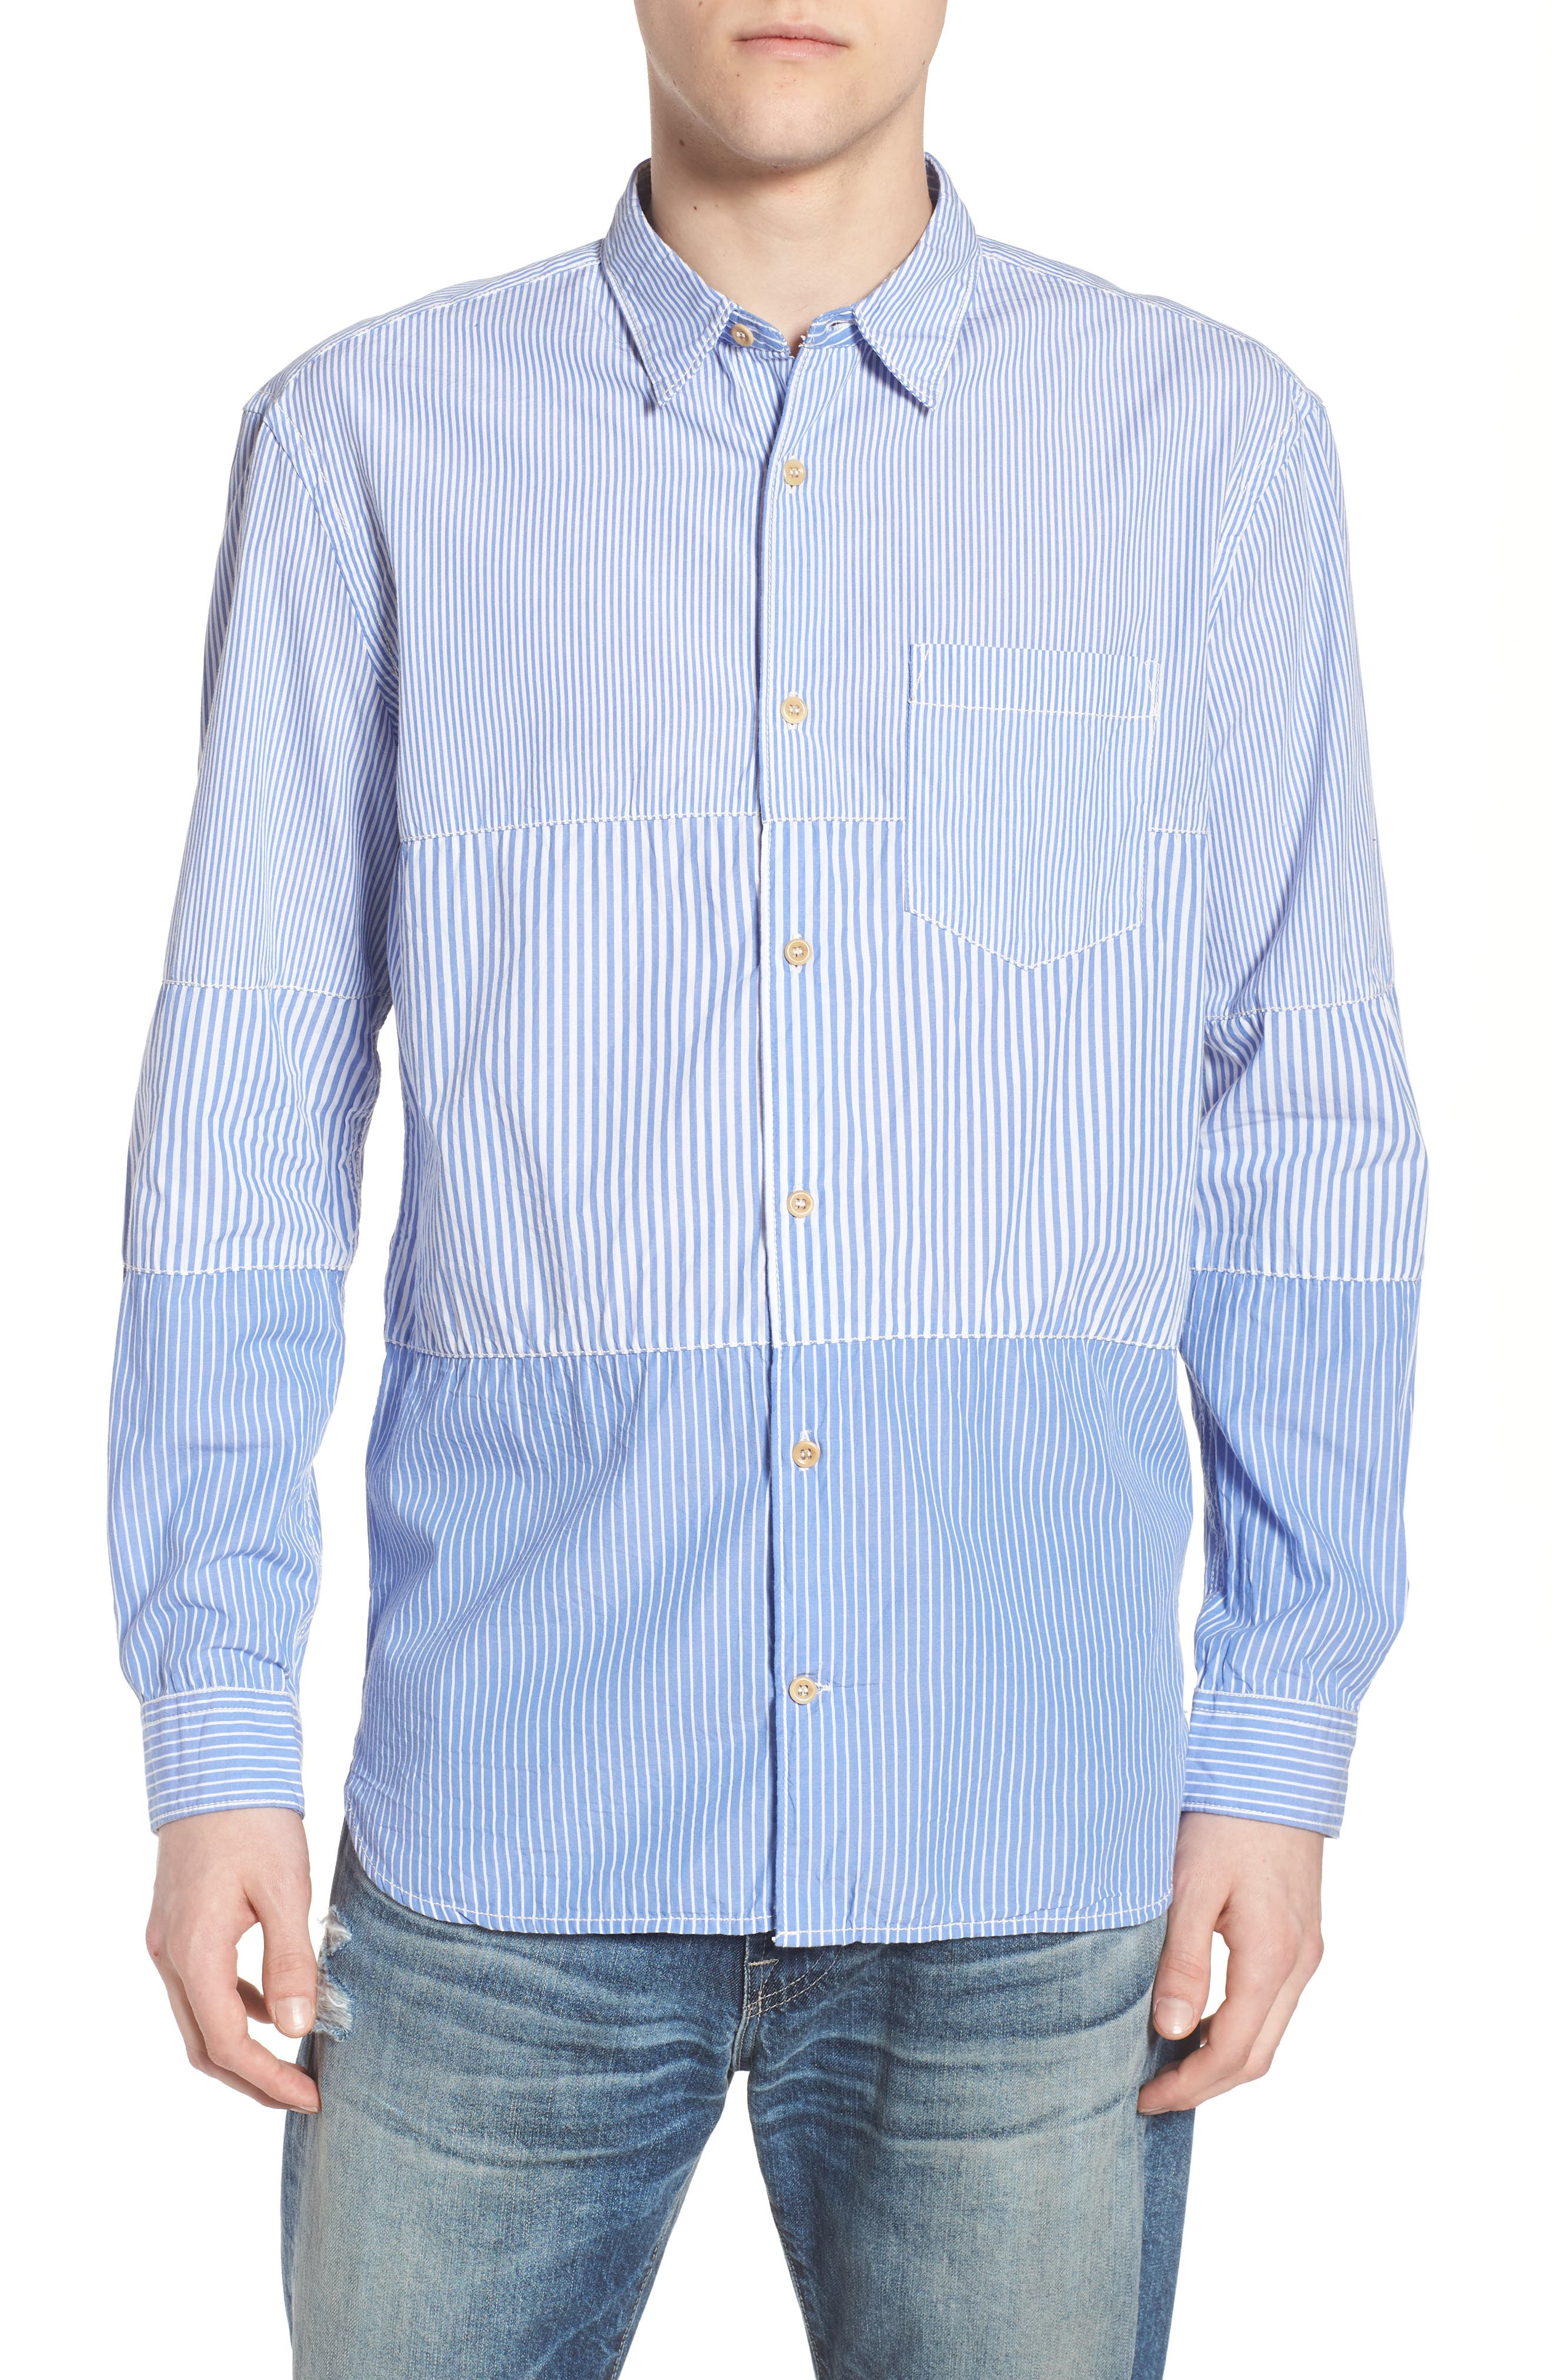 Regular Fit Stripe Sport Shirt,                             Main thumbnail 1, color,                             400